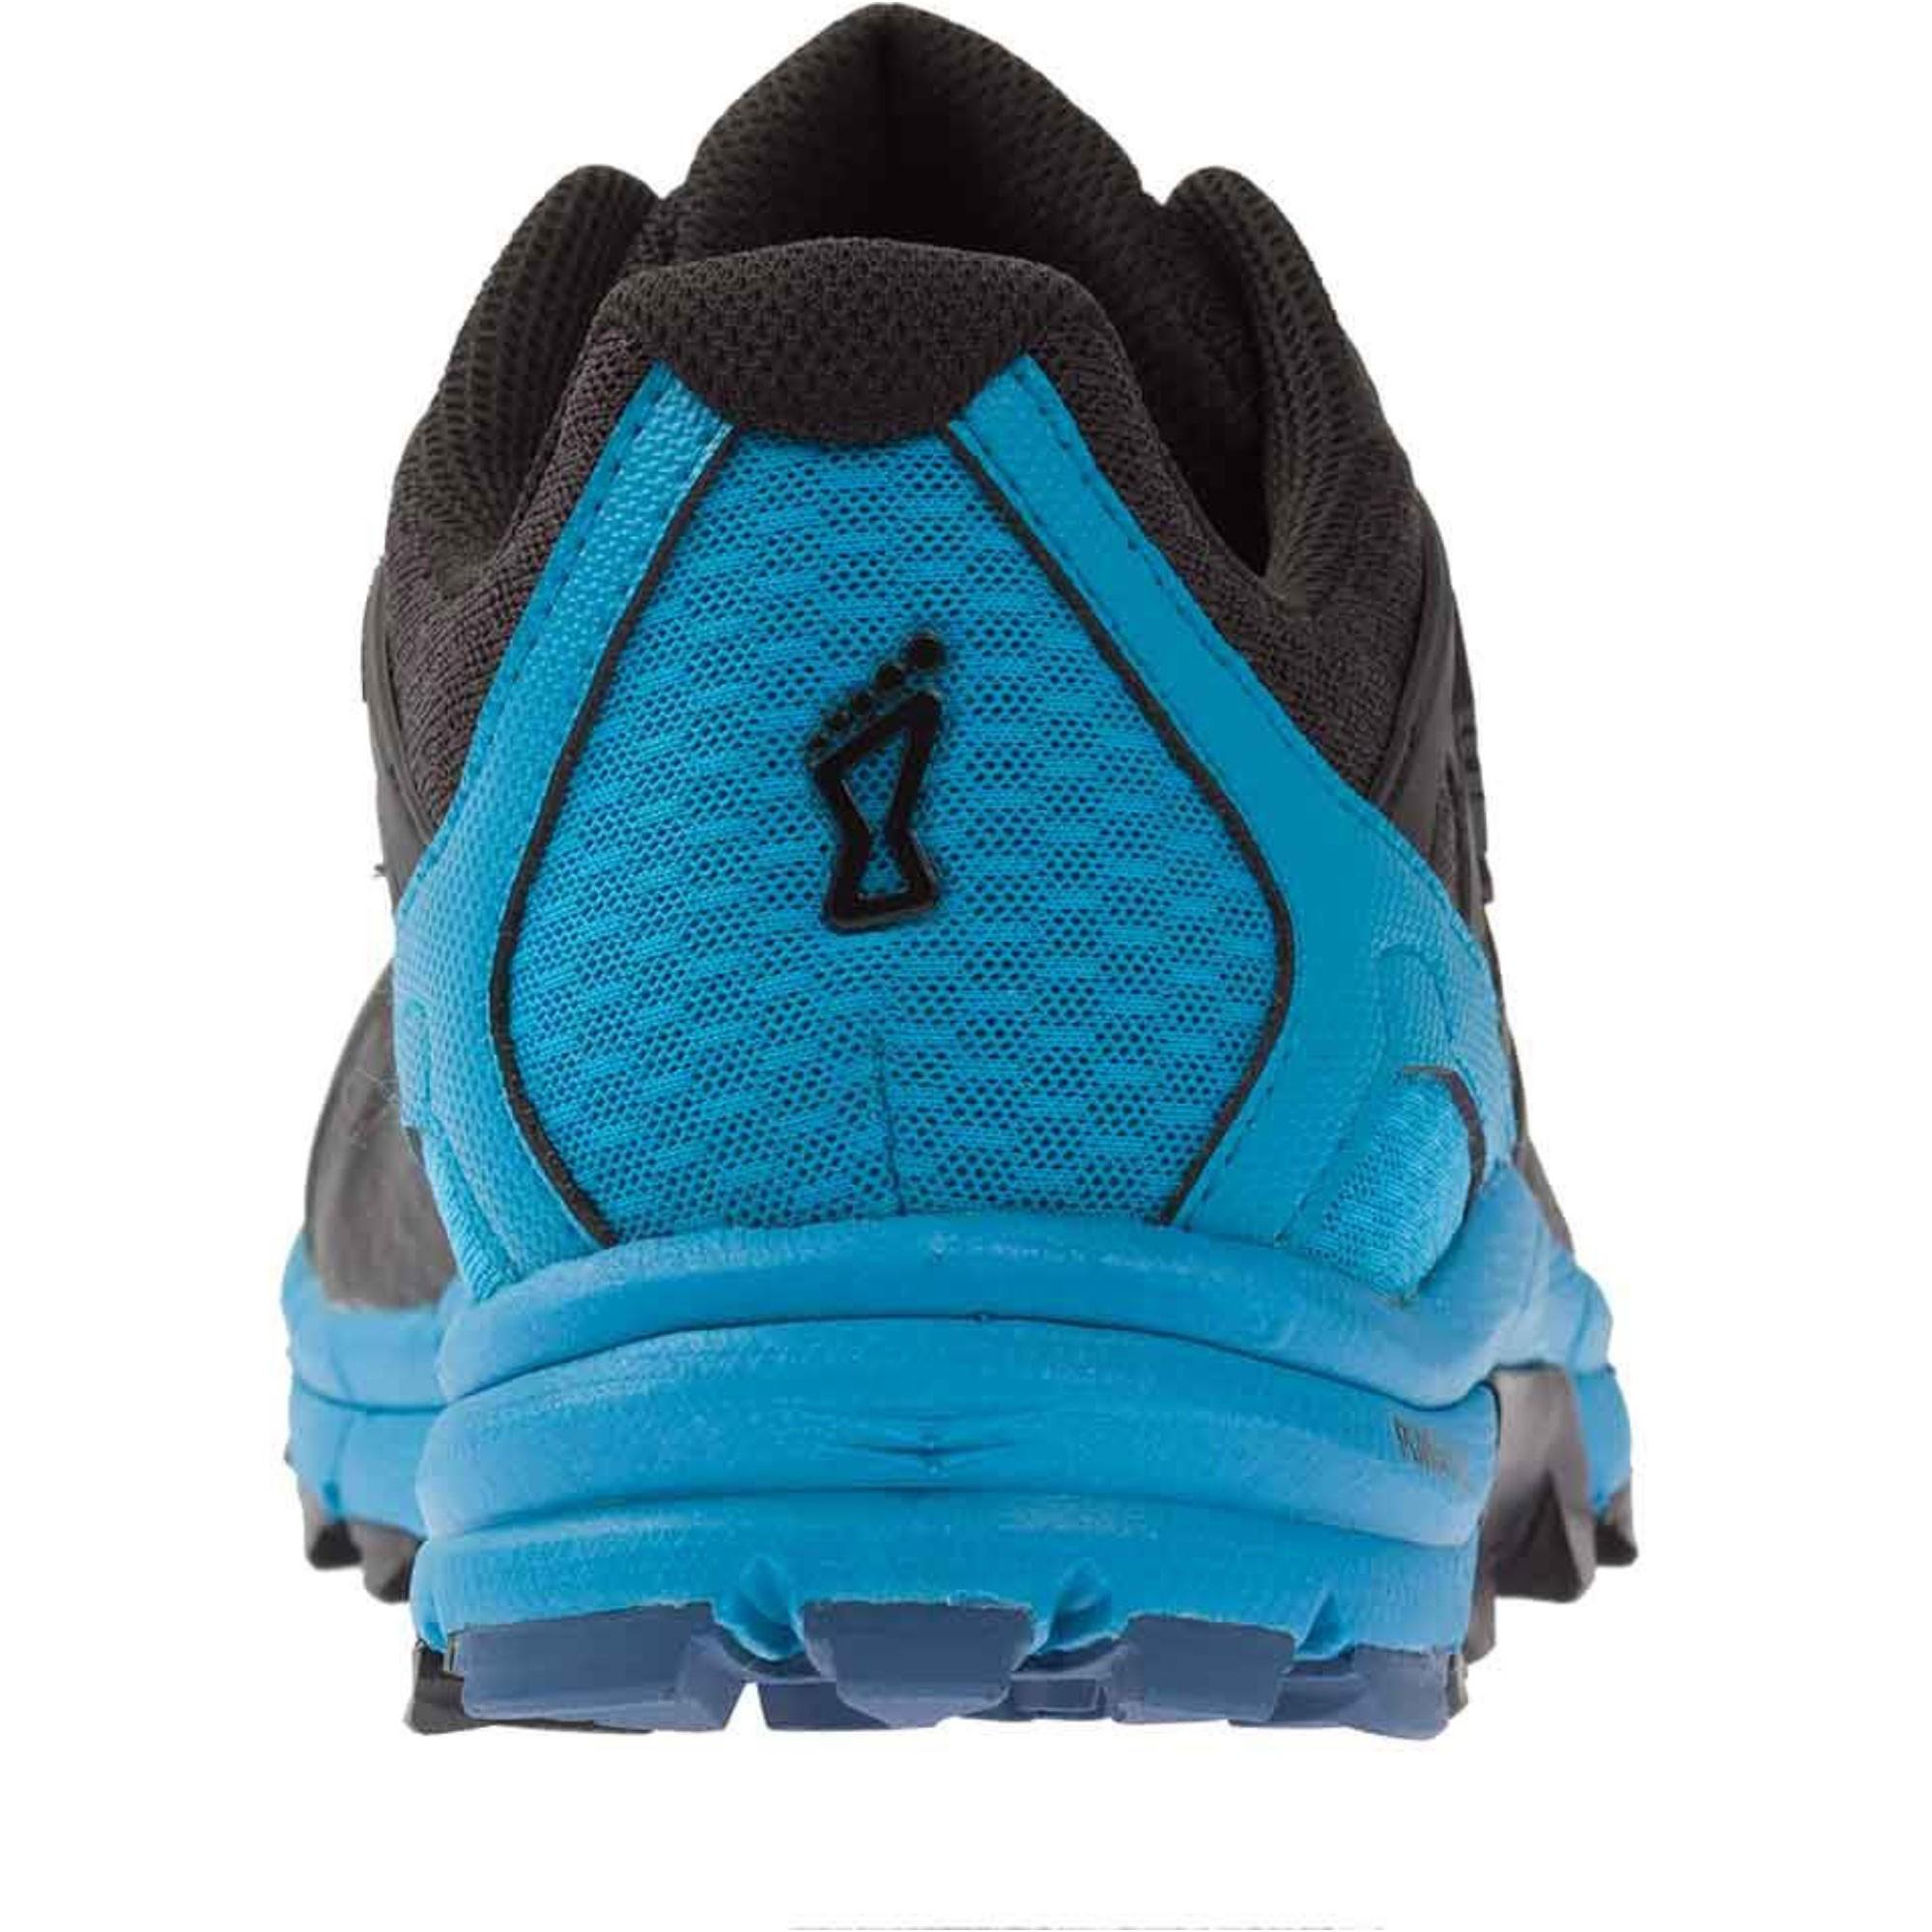 Inov8 Trail Talon 290 Trail Running Shoes - Black/Blue - Heel